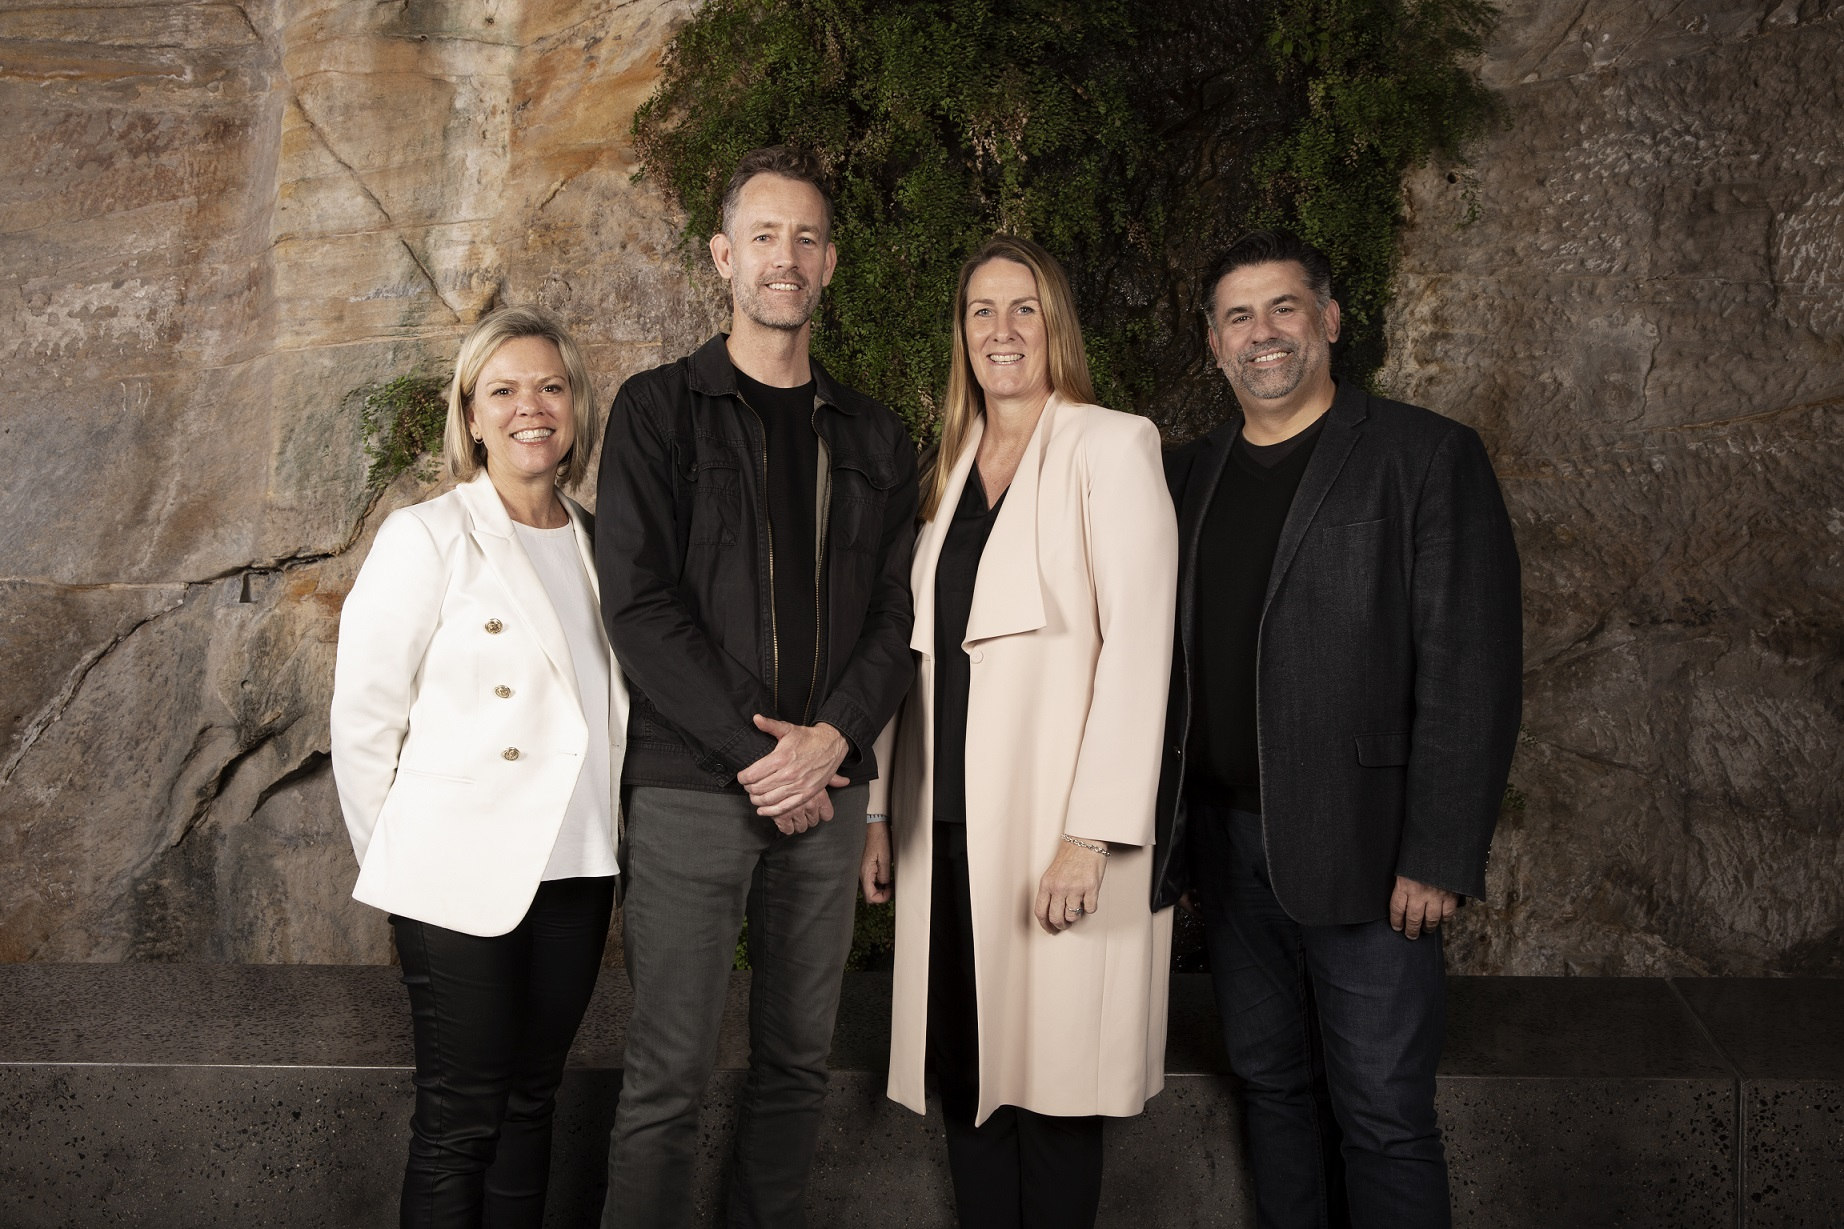 Ogilvy Sydney lures AKQA San Francisco's Gavin McLeod back to Australia to fill Executive CD role